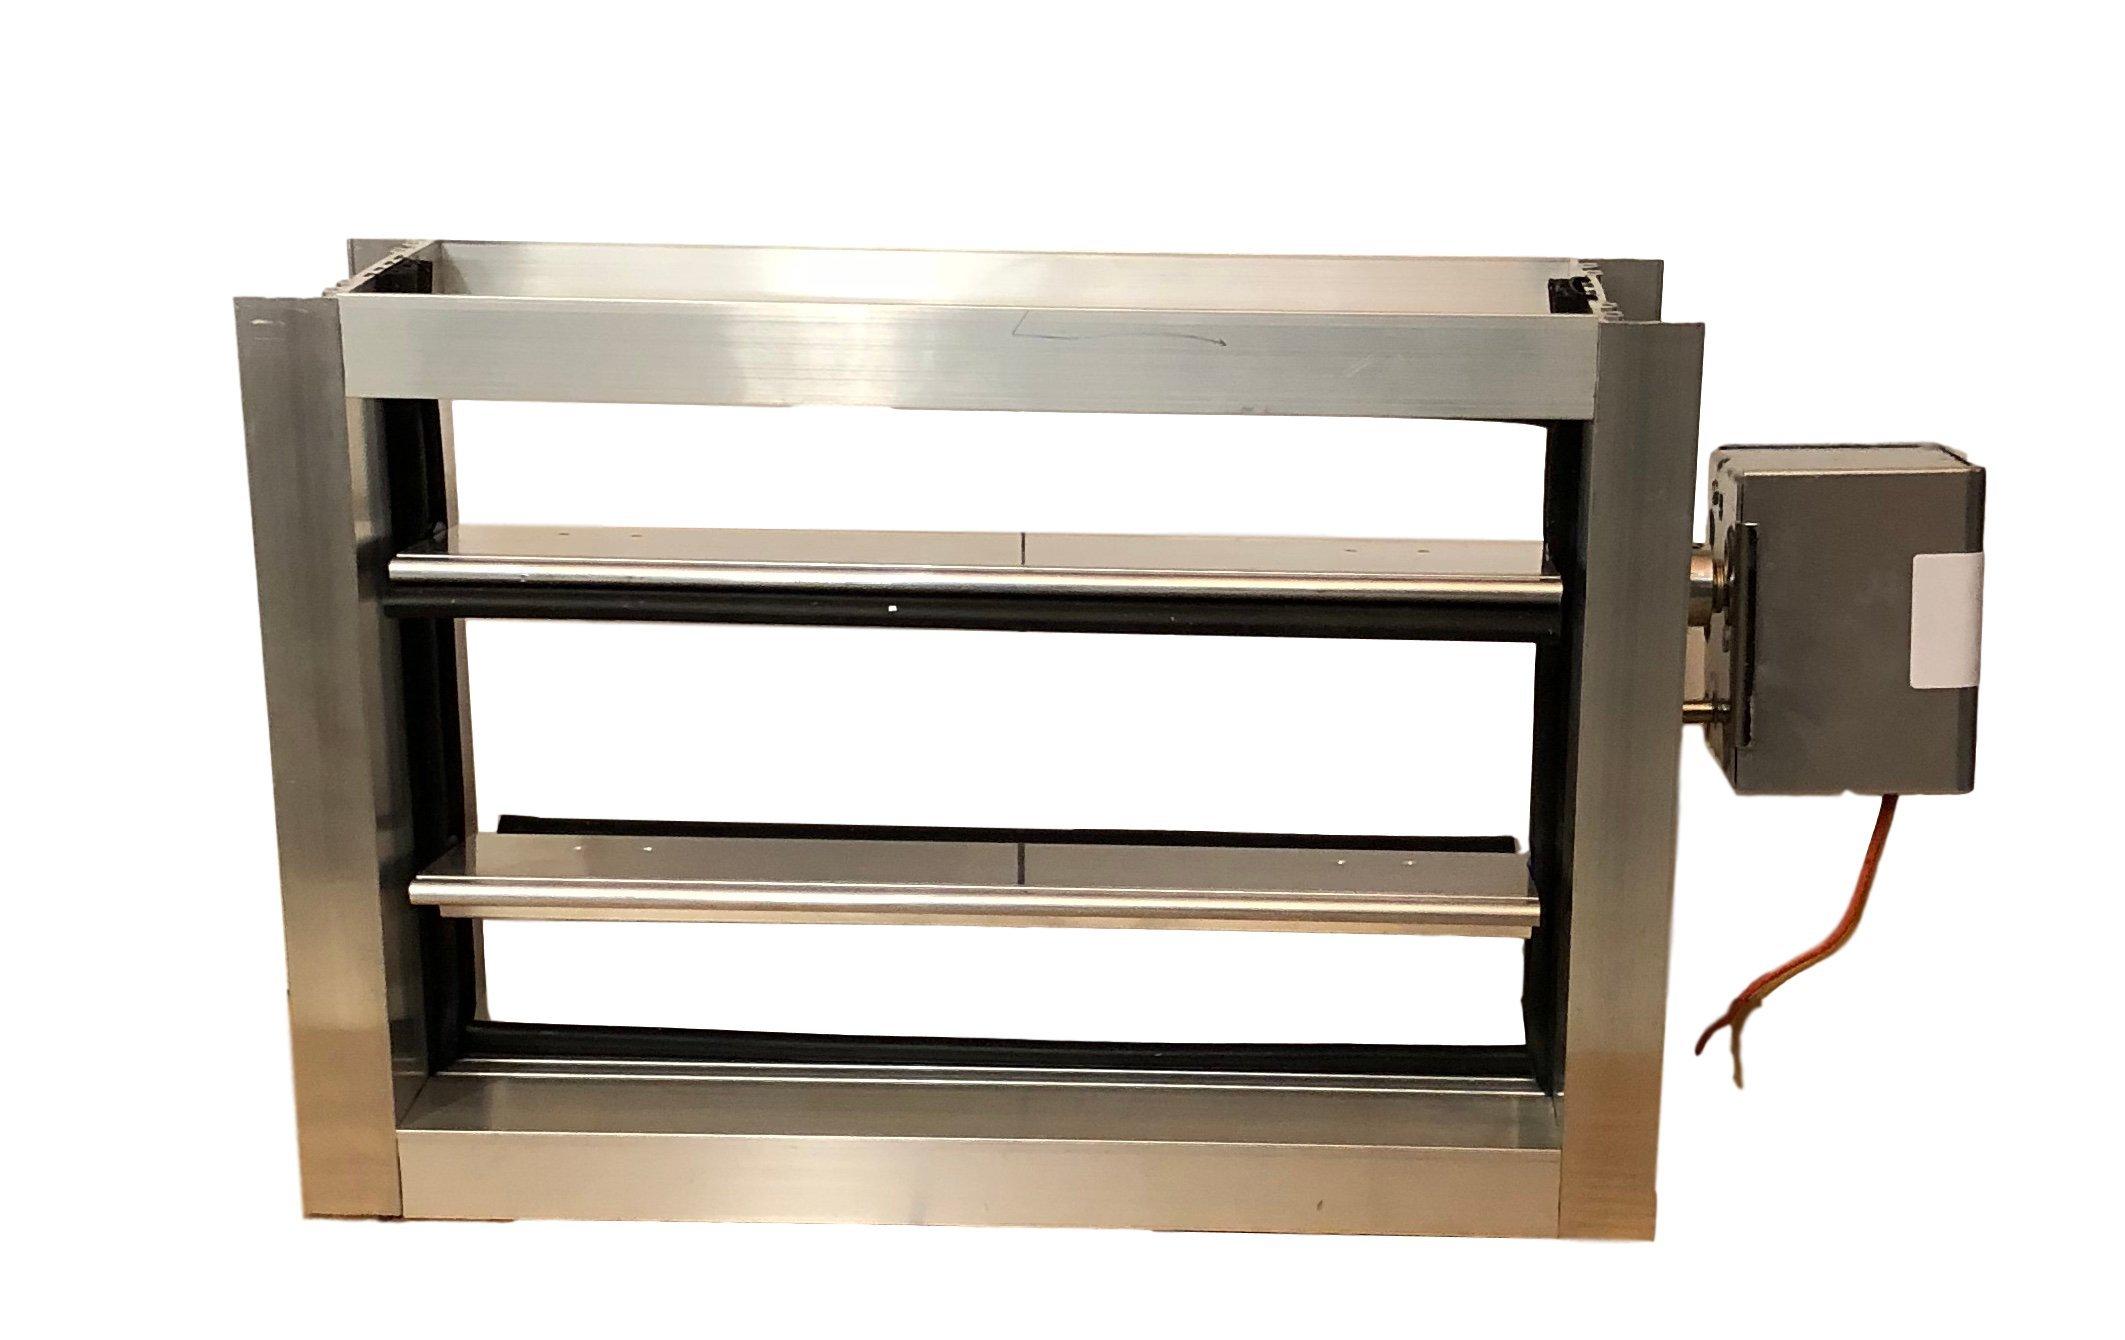 Escpec 12x8 Aluminum Motorized Damper/24 Vac, Normally Open (Power close/Spring open)